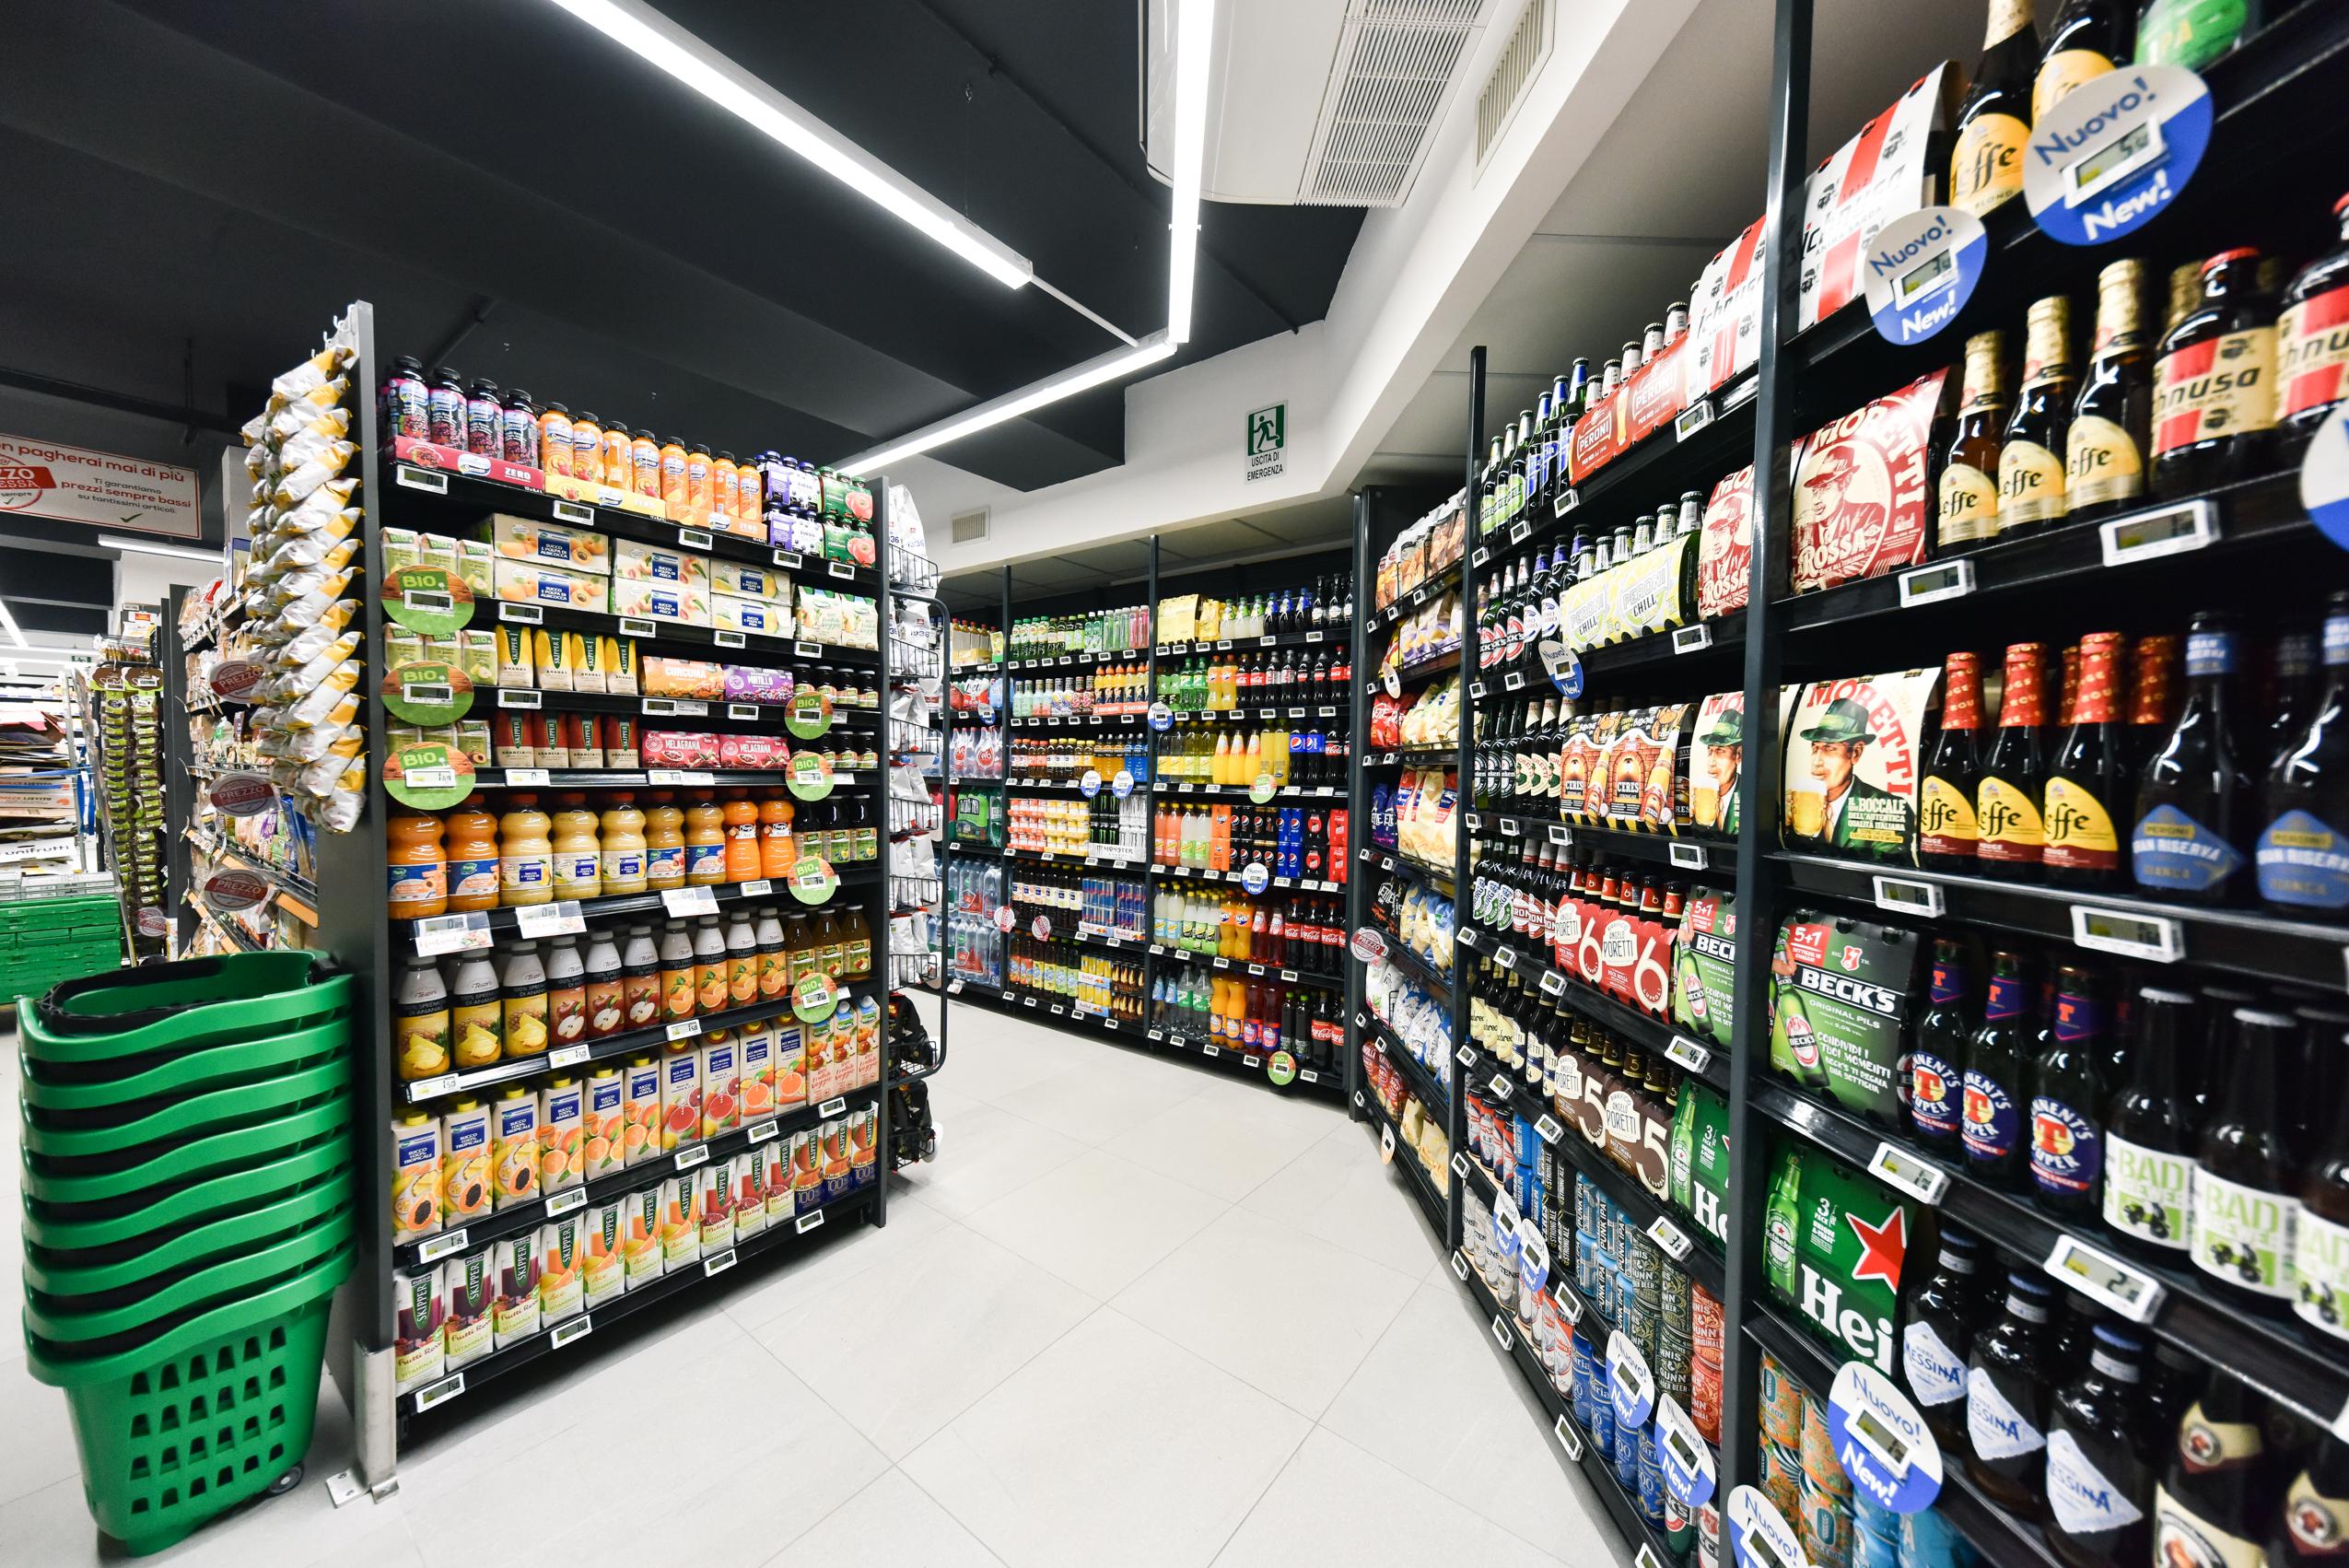 Supermercato Pam in Via Flaminia